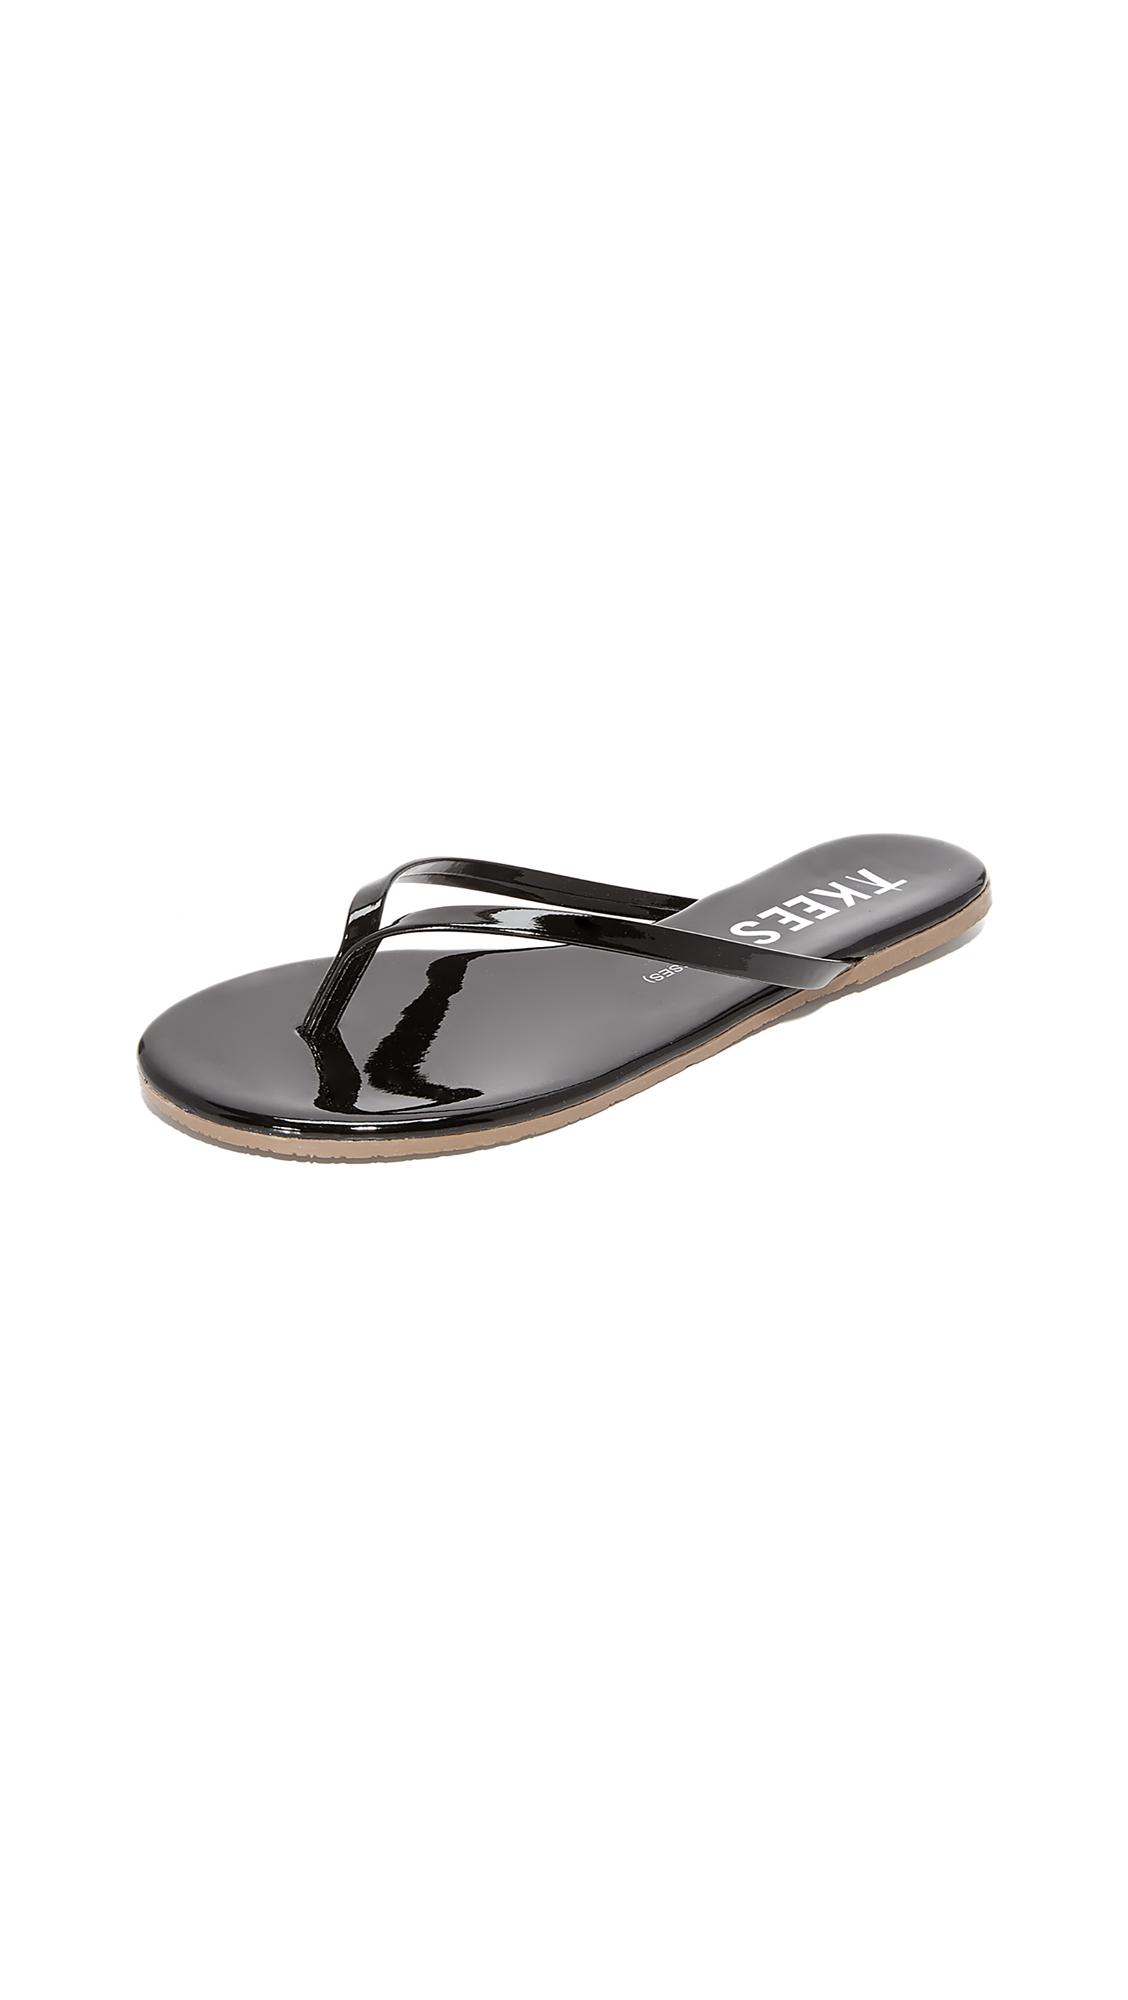 TKEES Glosses Flip Flops